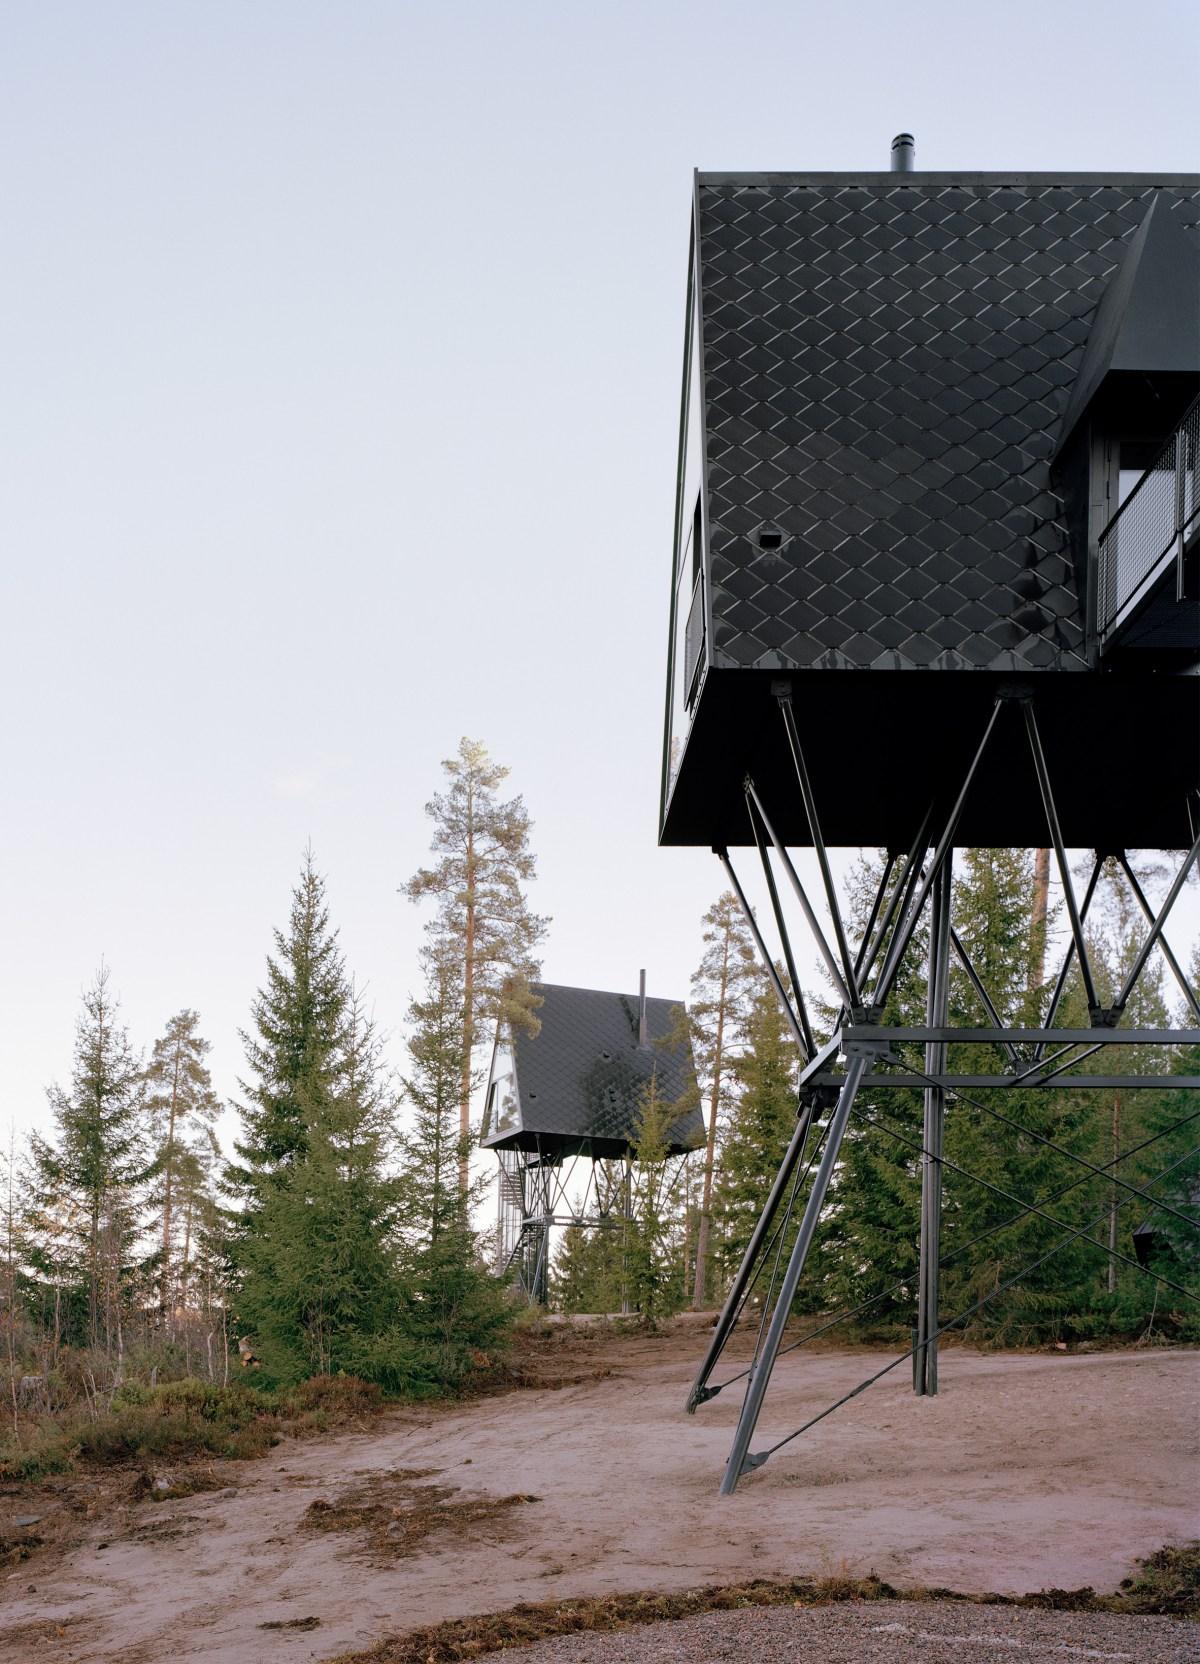 pan-treetop-cabins-espen-surnevik-woodland-architecture-norway-_dezeen_2364_col_11